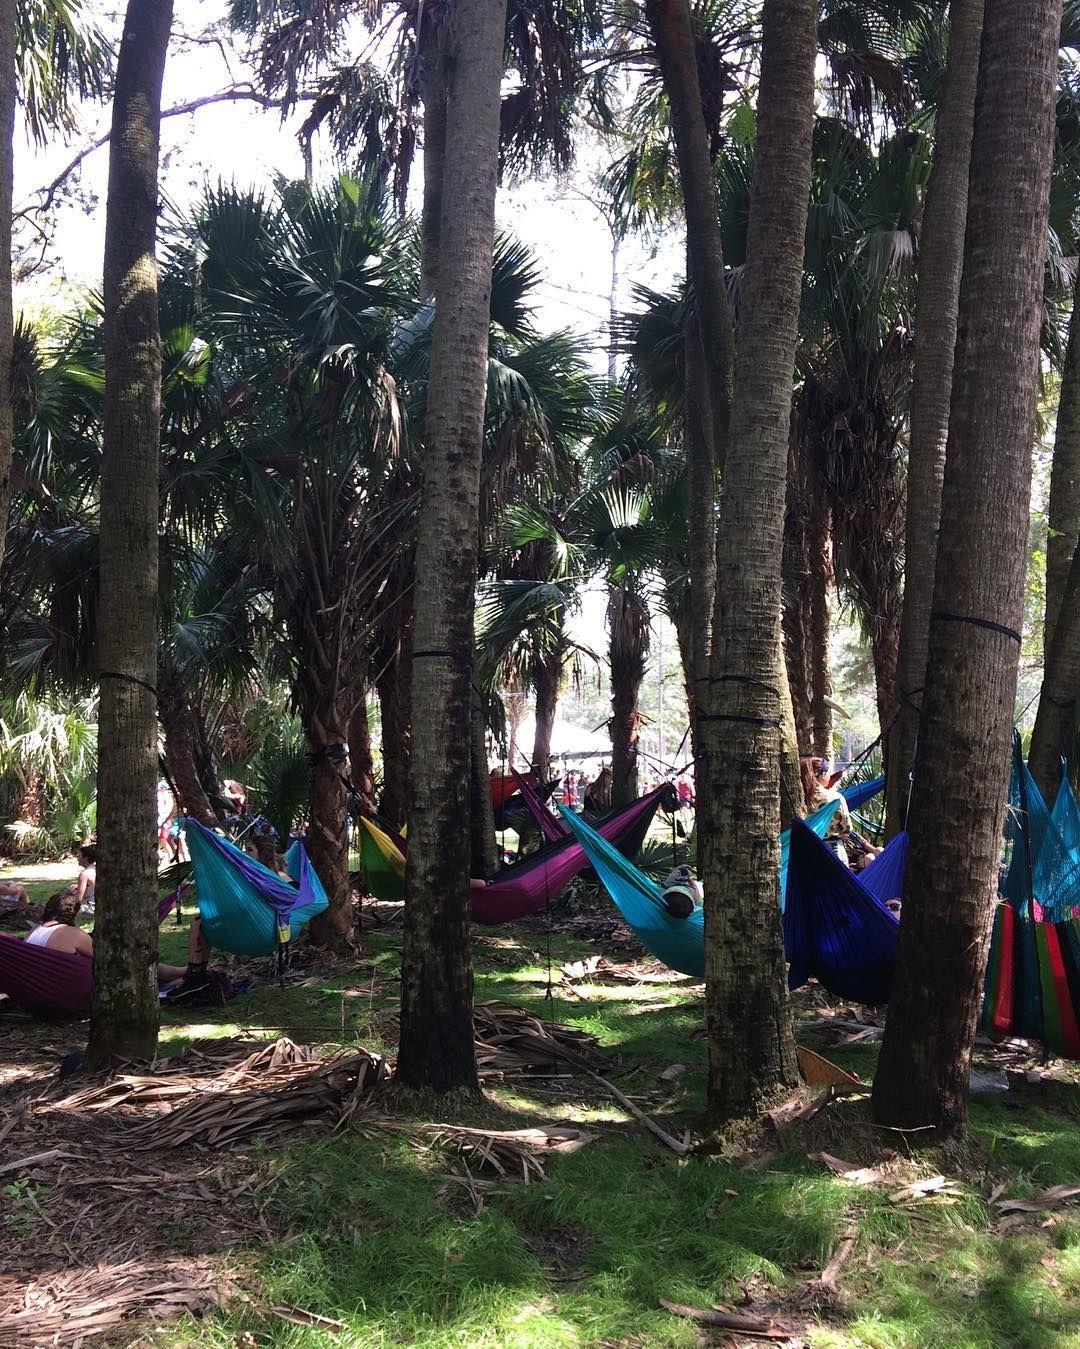 I need a hammock in my life hammocklife by nomadicones